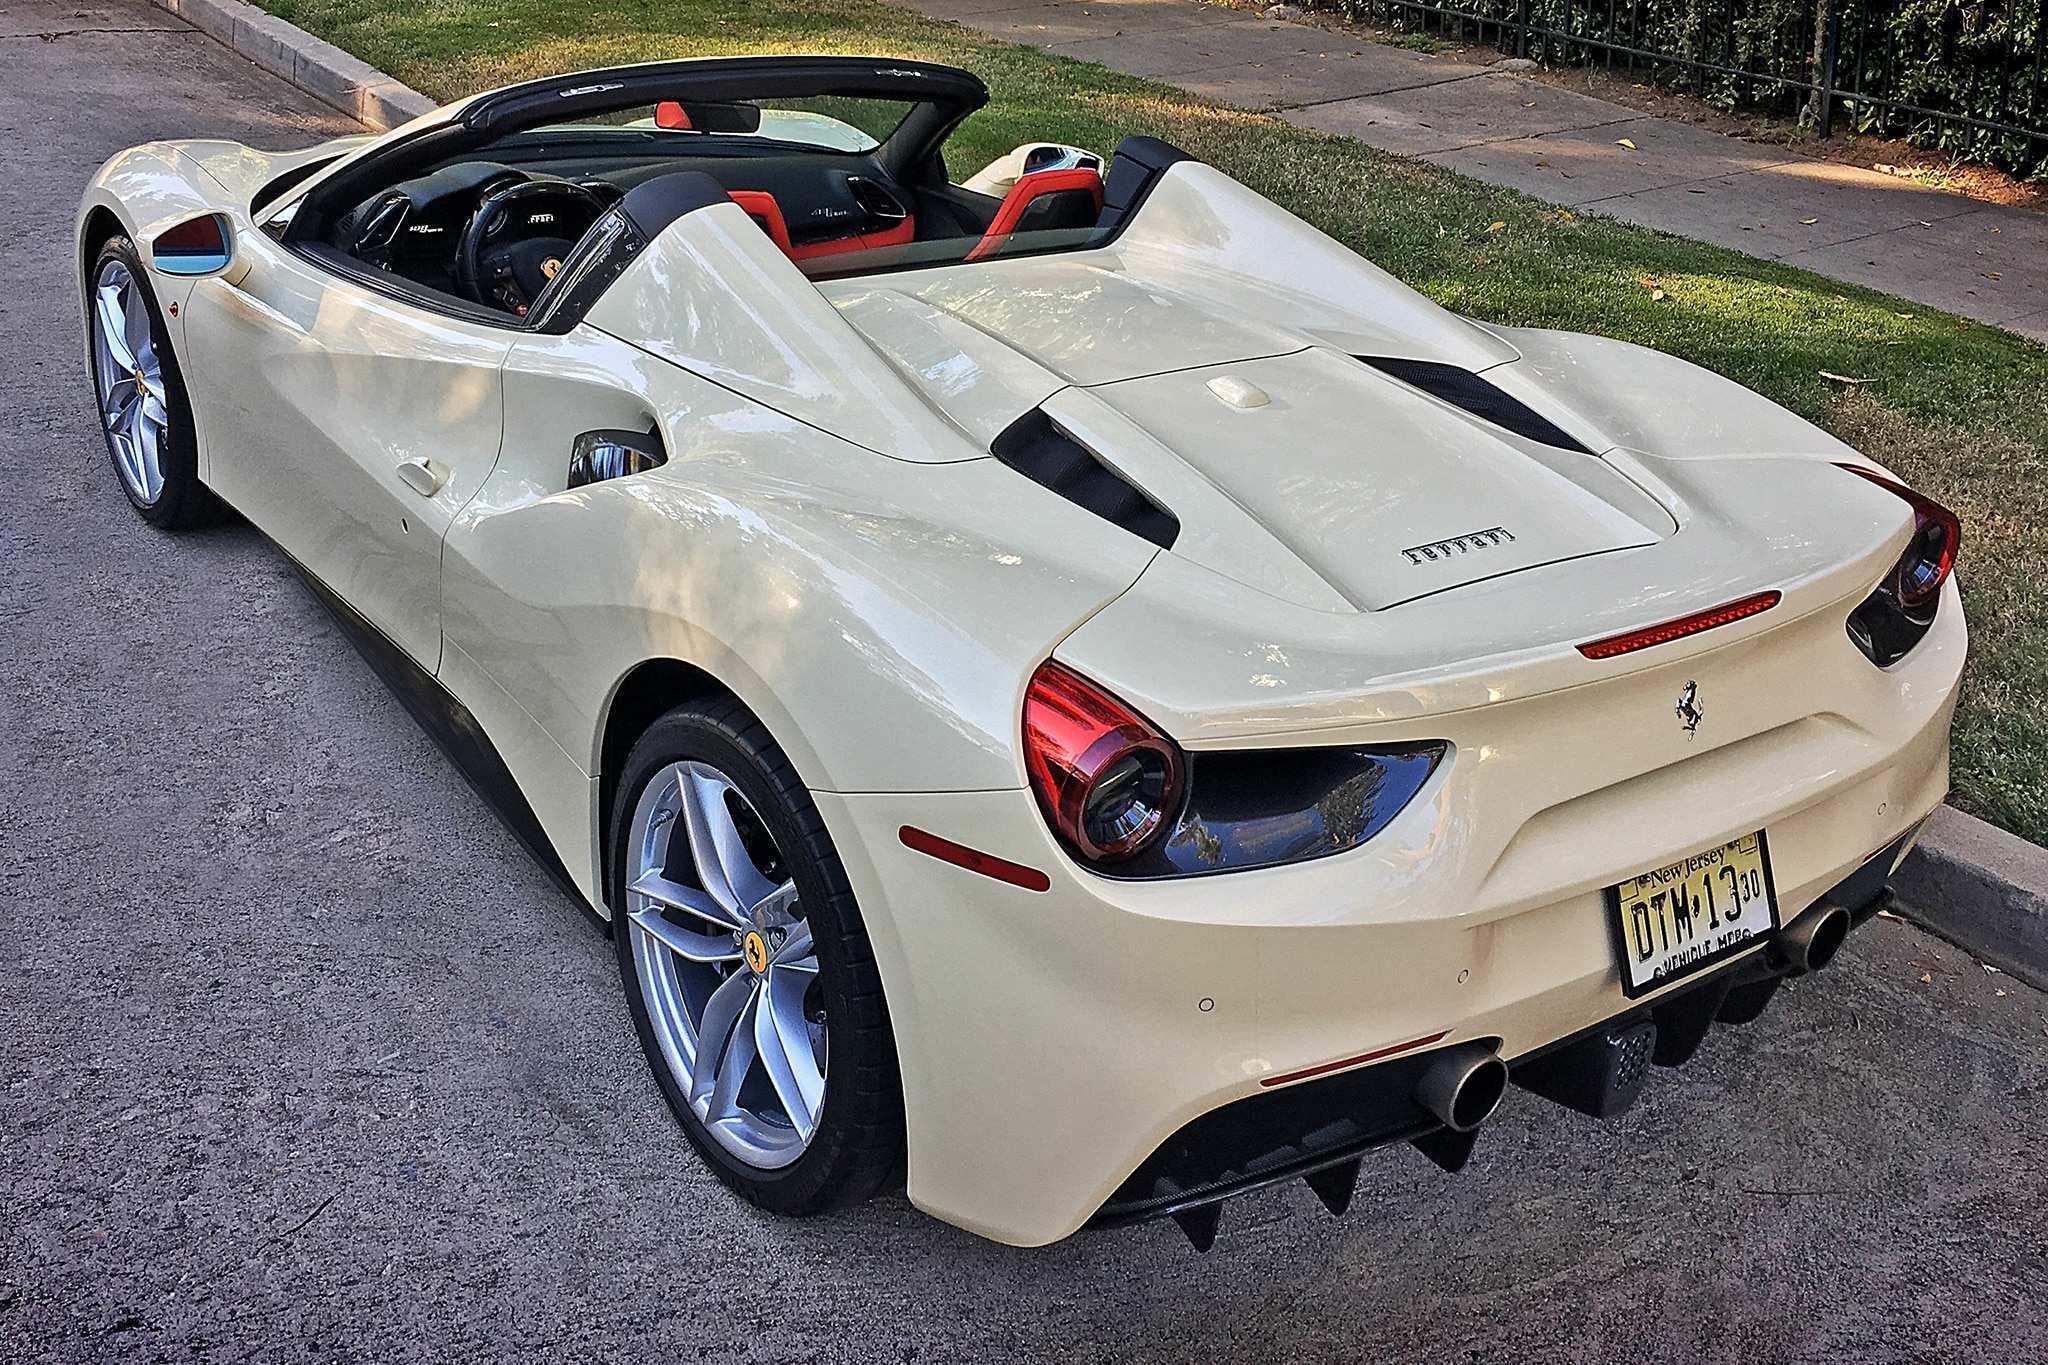 2020 Ferrari 488 Spider For Sale - Car Review : Car Review